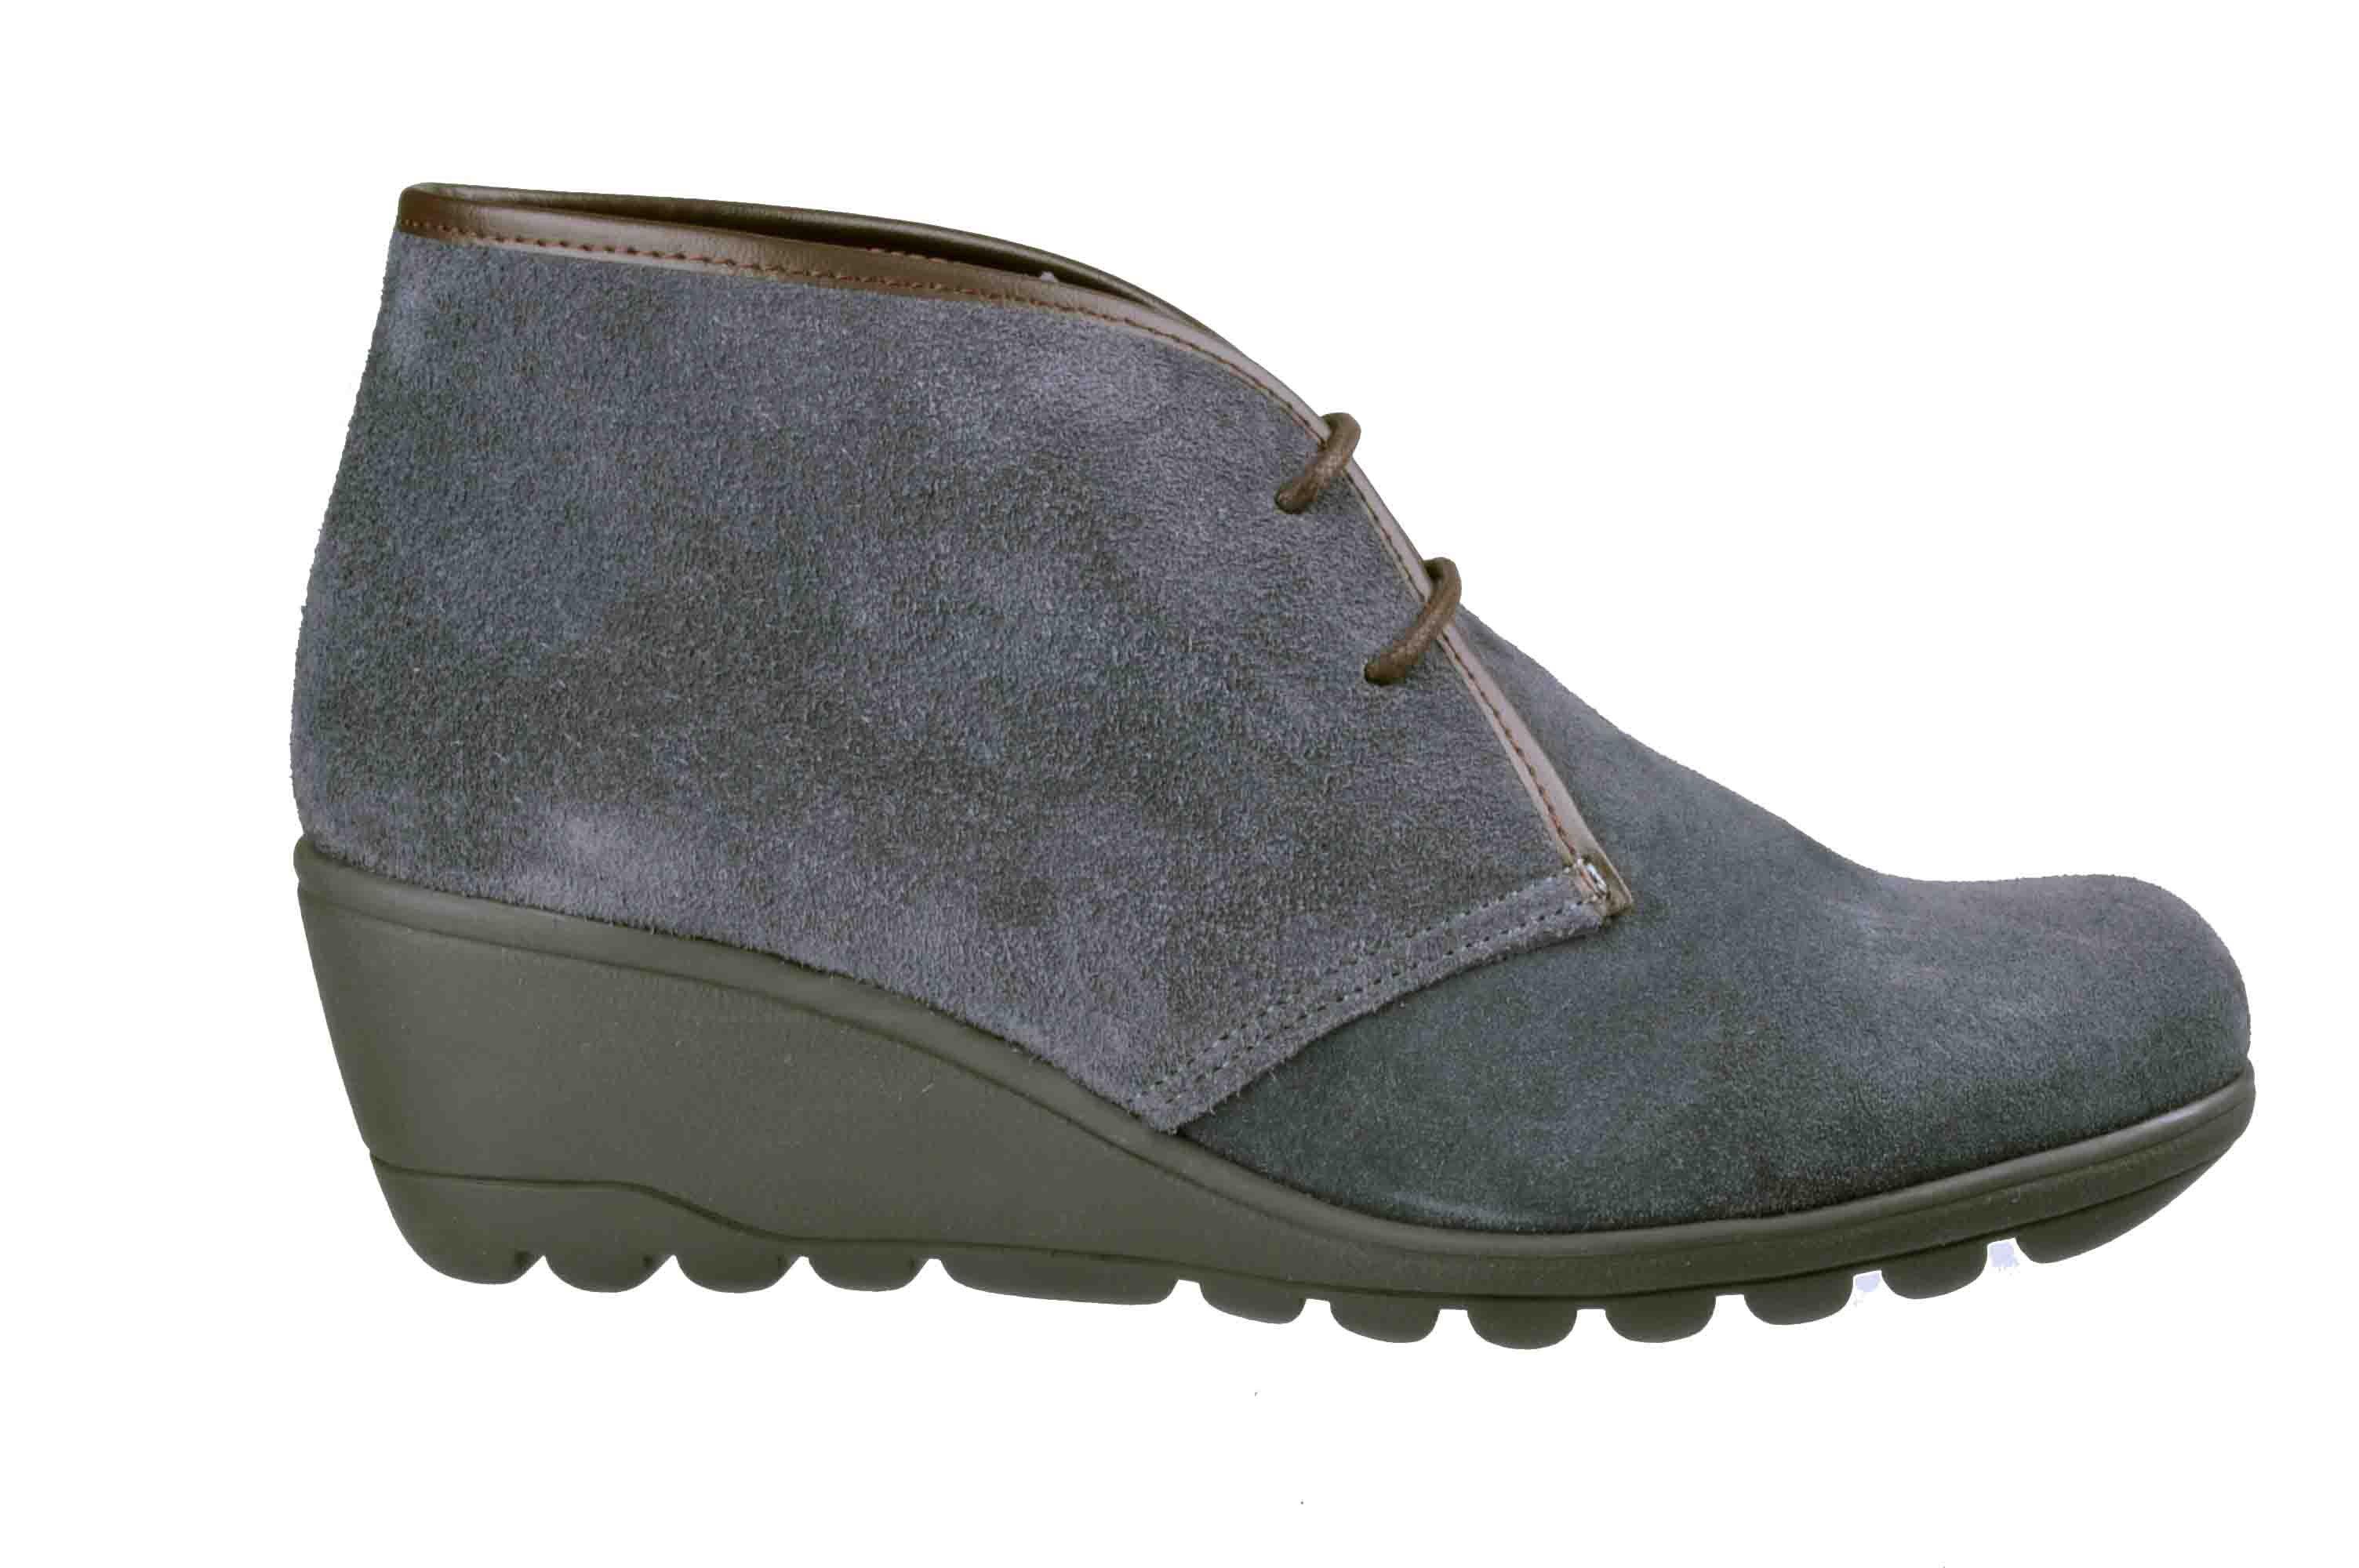 1b779a170d4 ... Γυναικεια Δερματινα Μποτακια Apostolidis Shoes City Ανθρακι